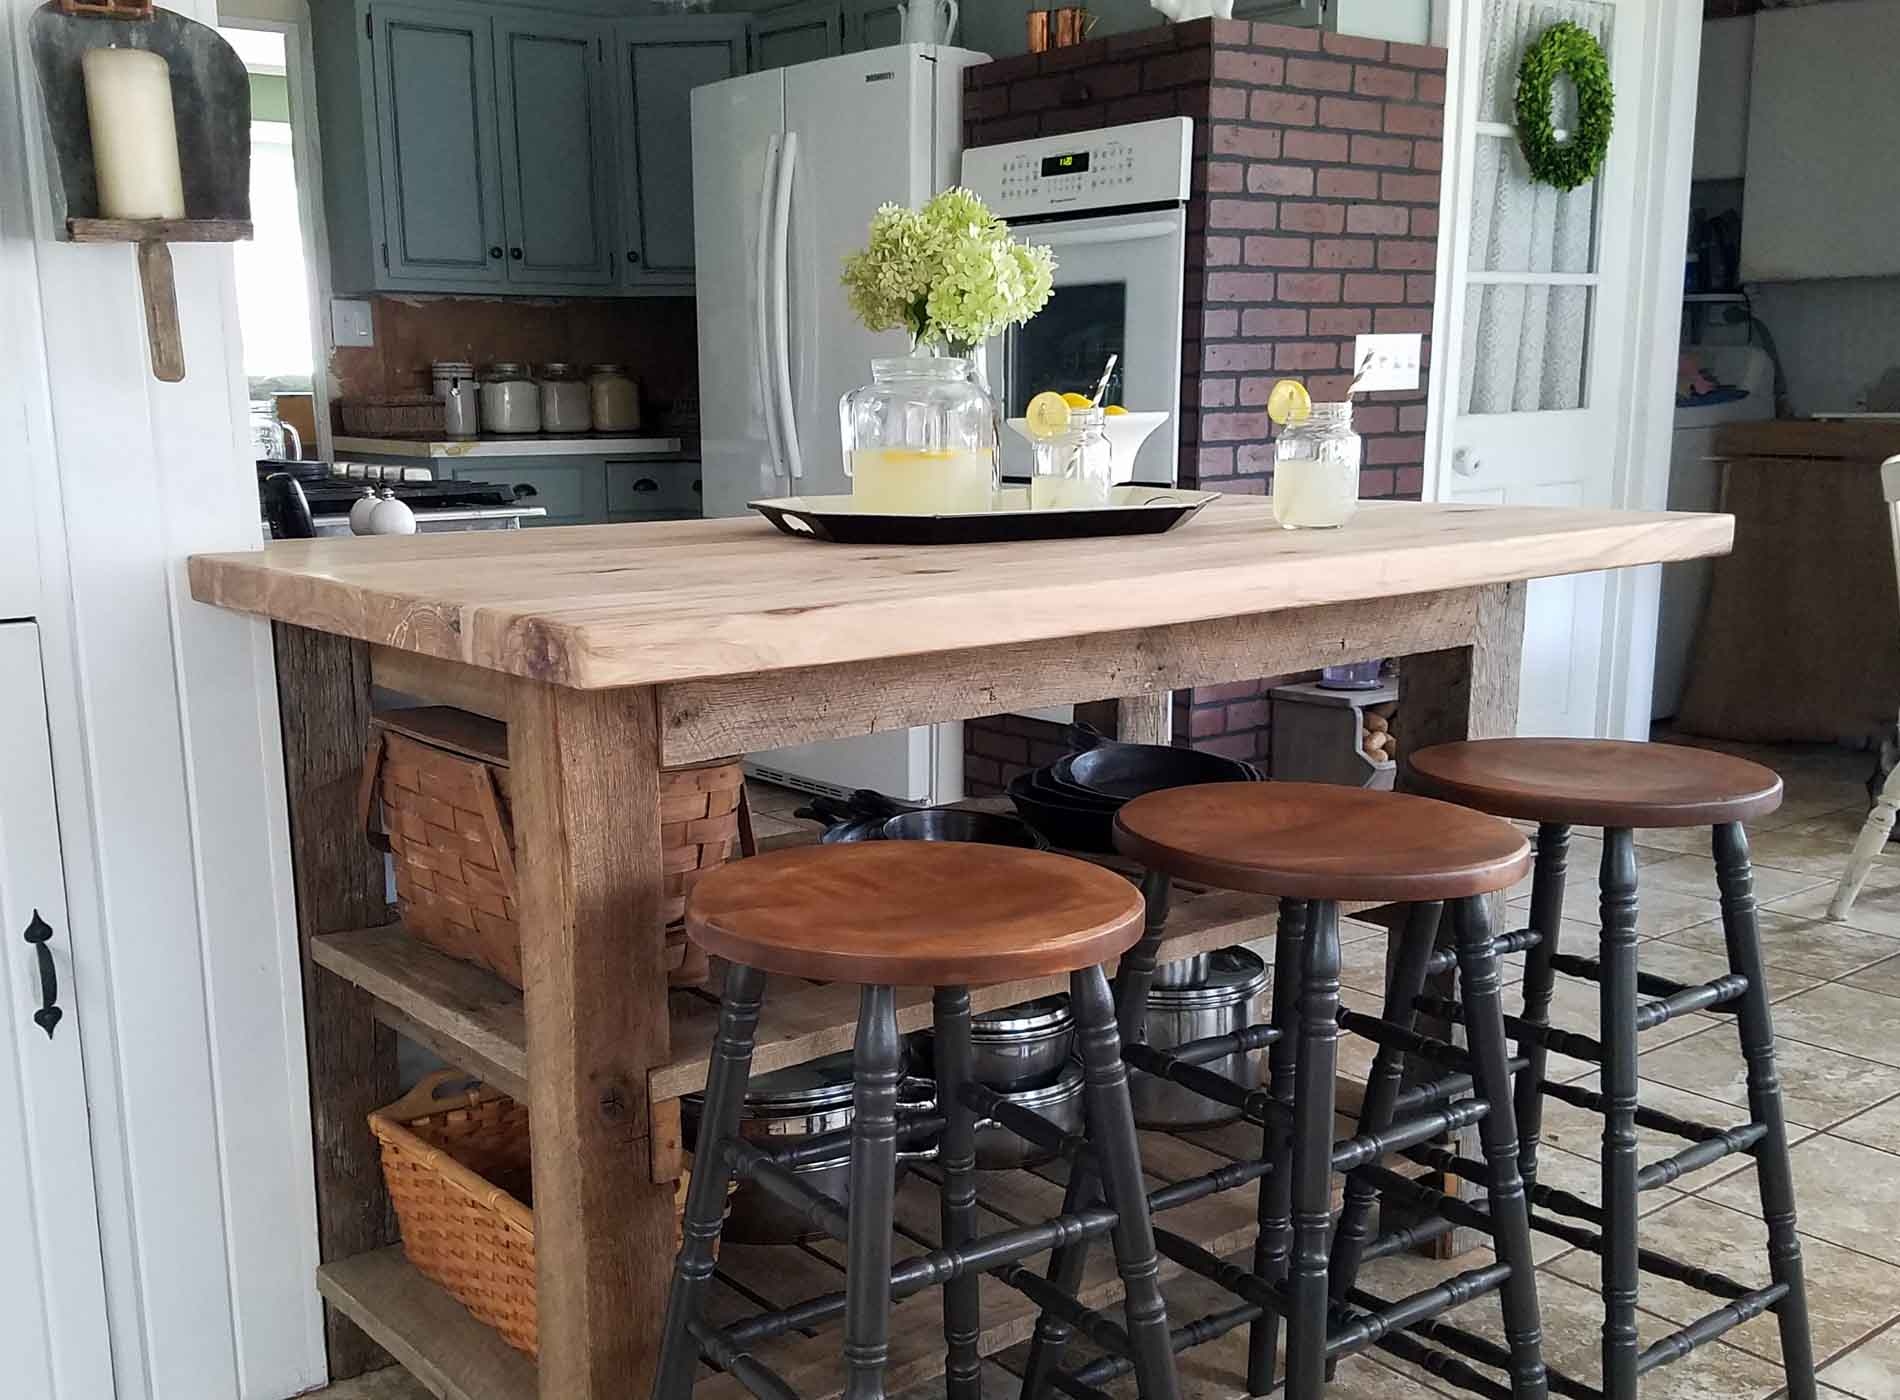 Featured Farmhouse Bar Stools by Prodigal Pieces | prodigalpieces.com